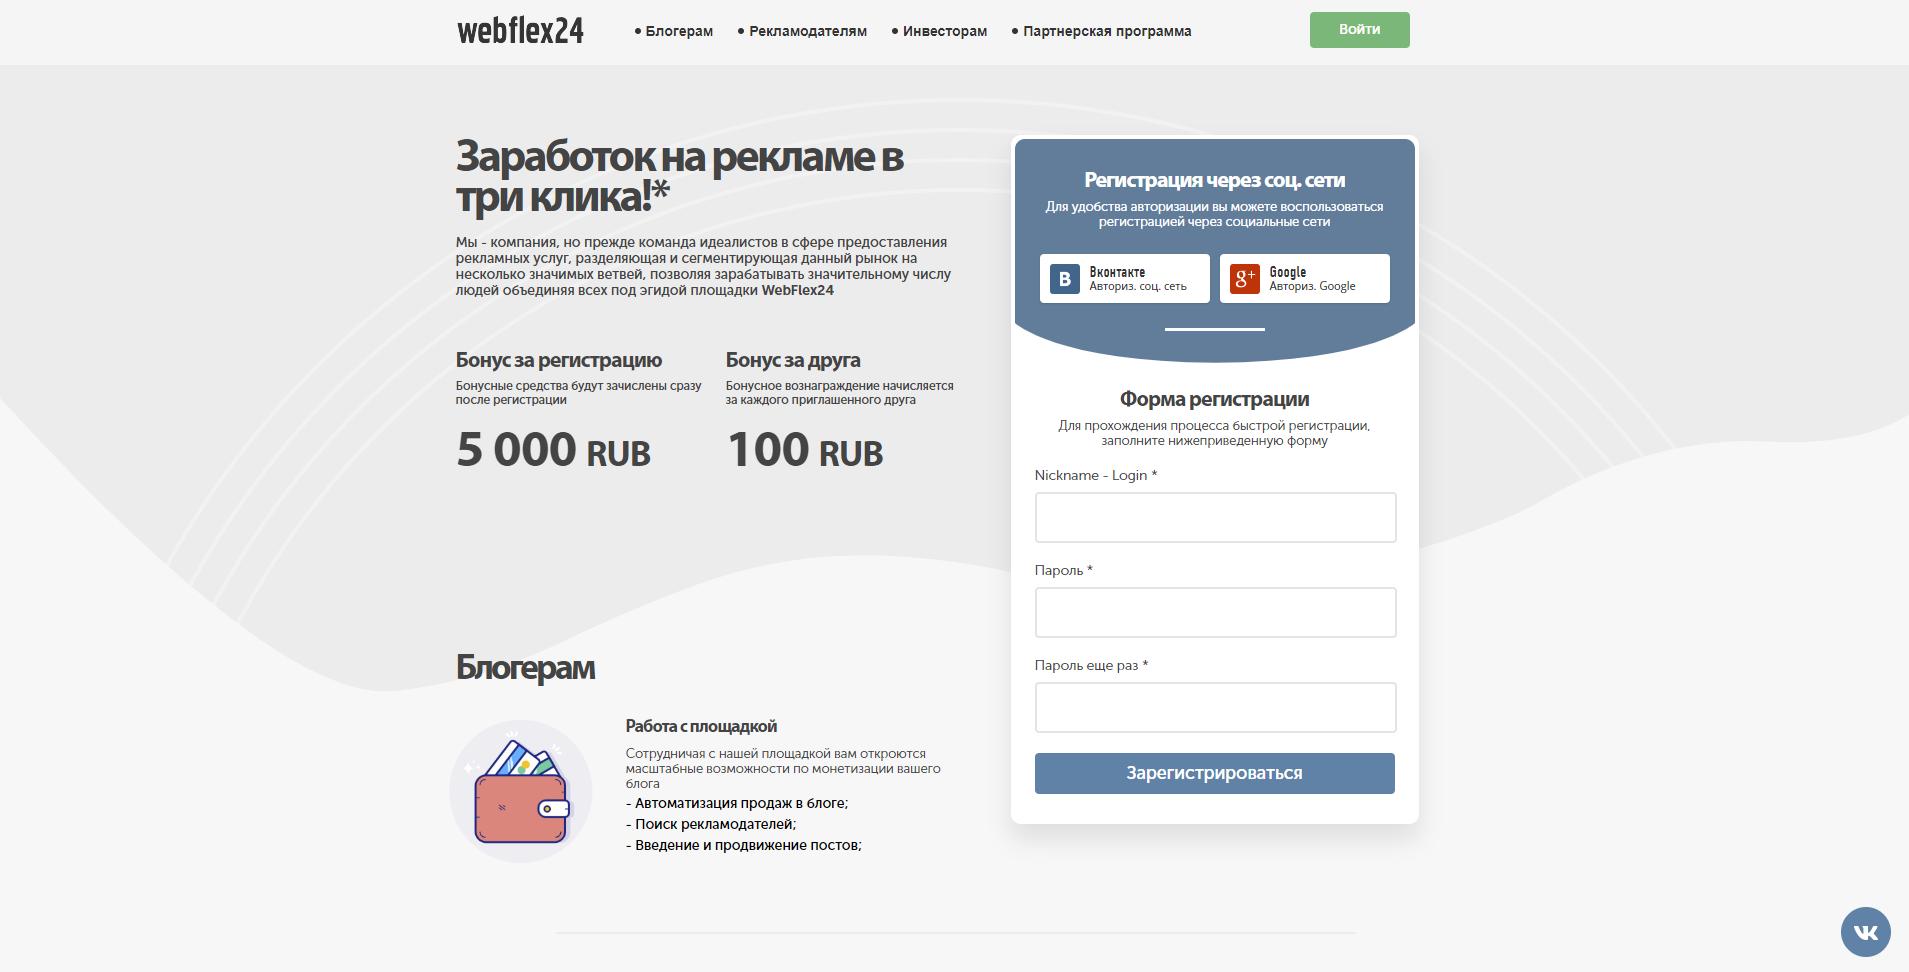 webflex24 - webflex24.com